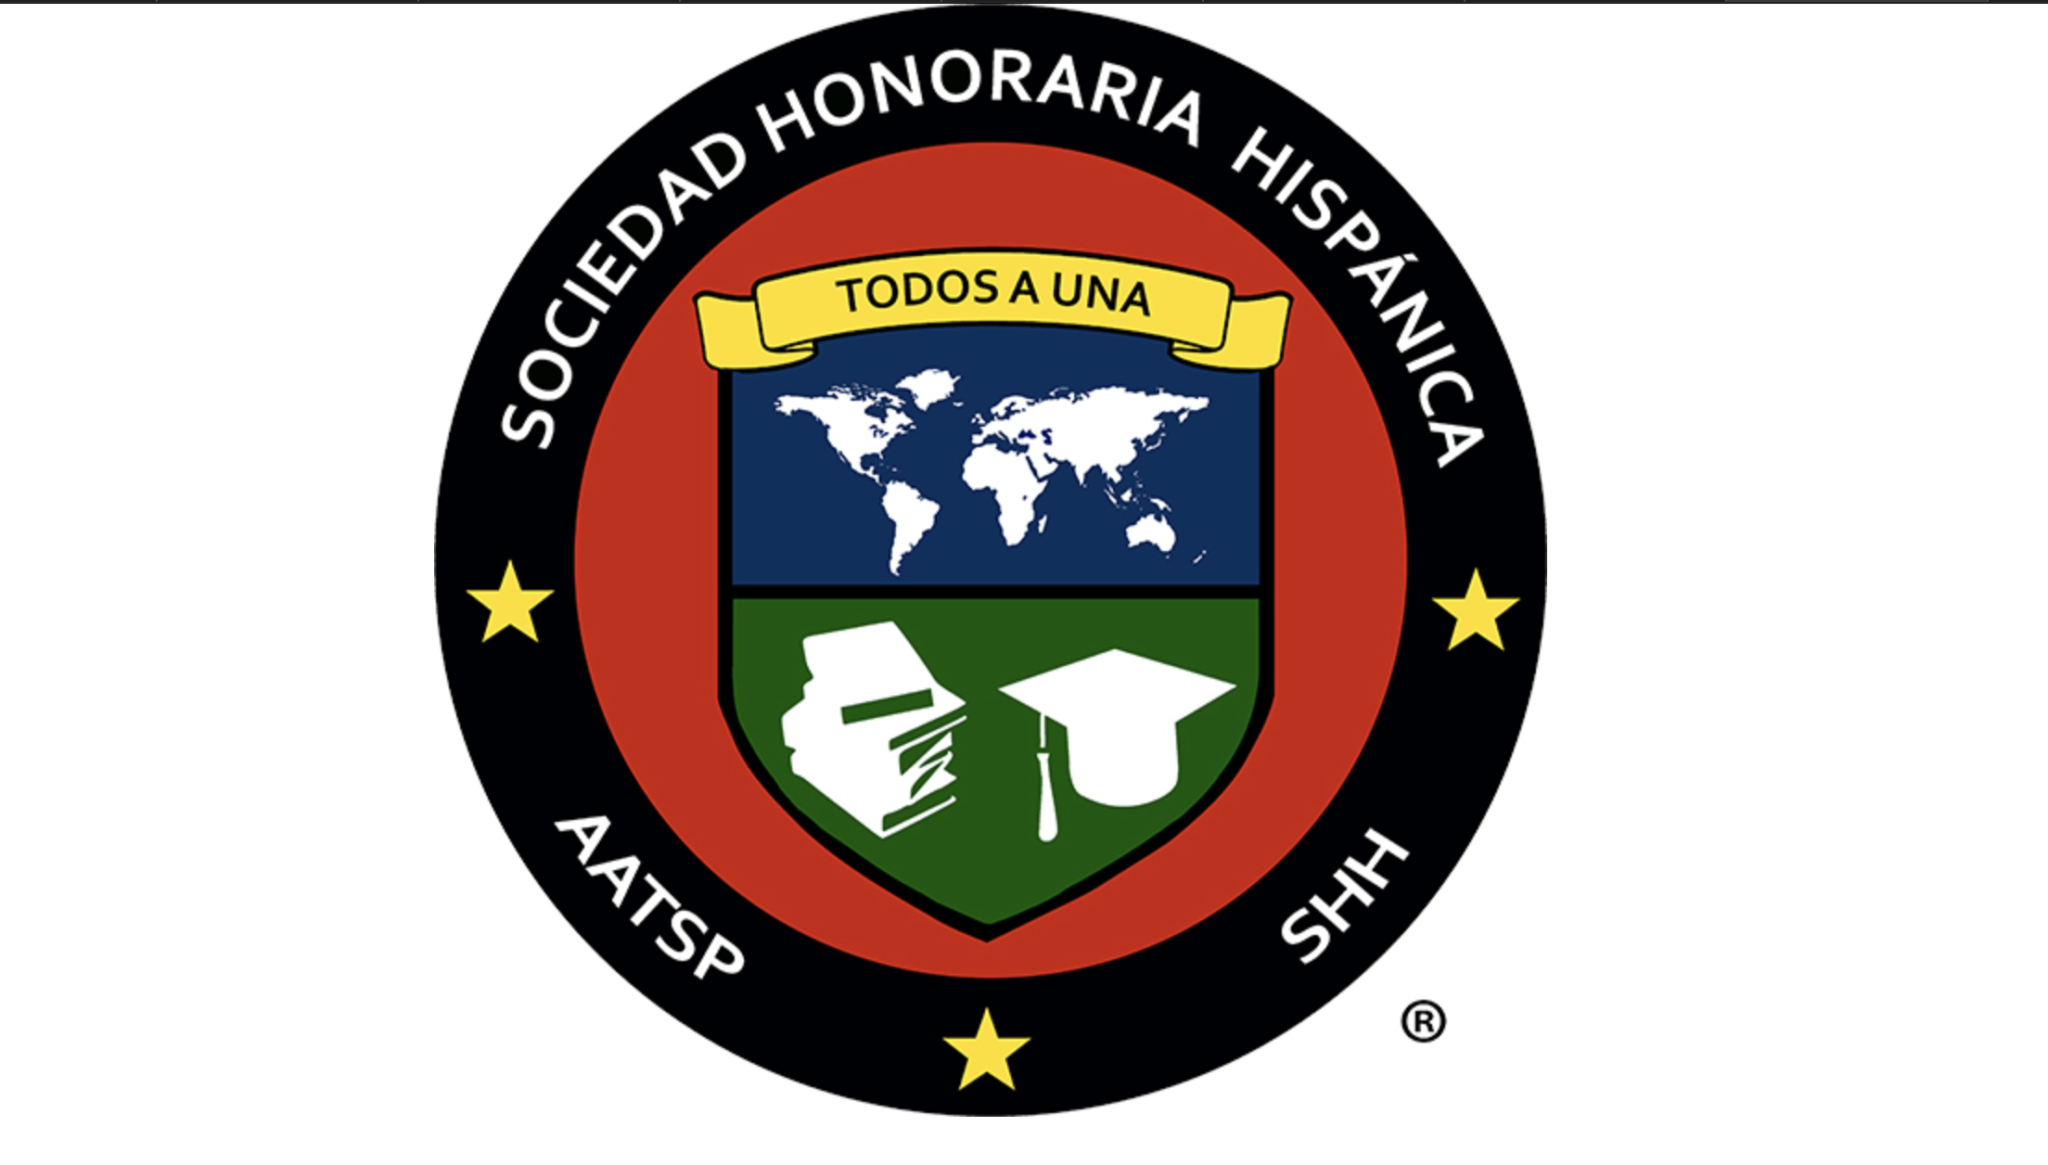 sociedad honoraria hispanica